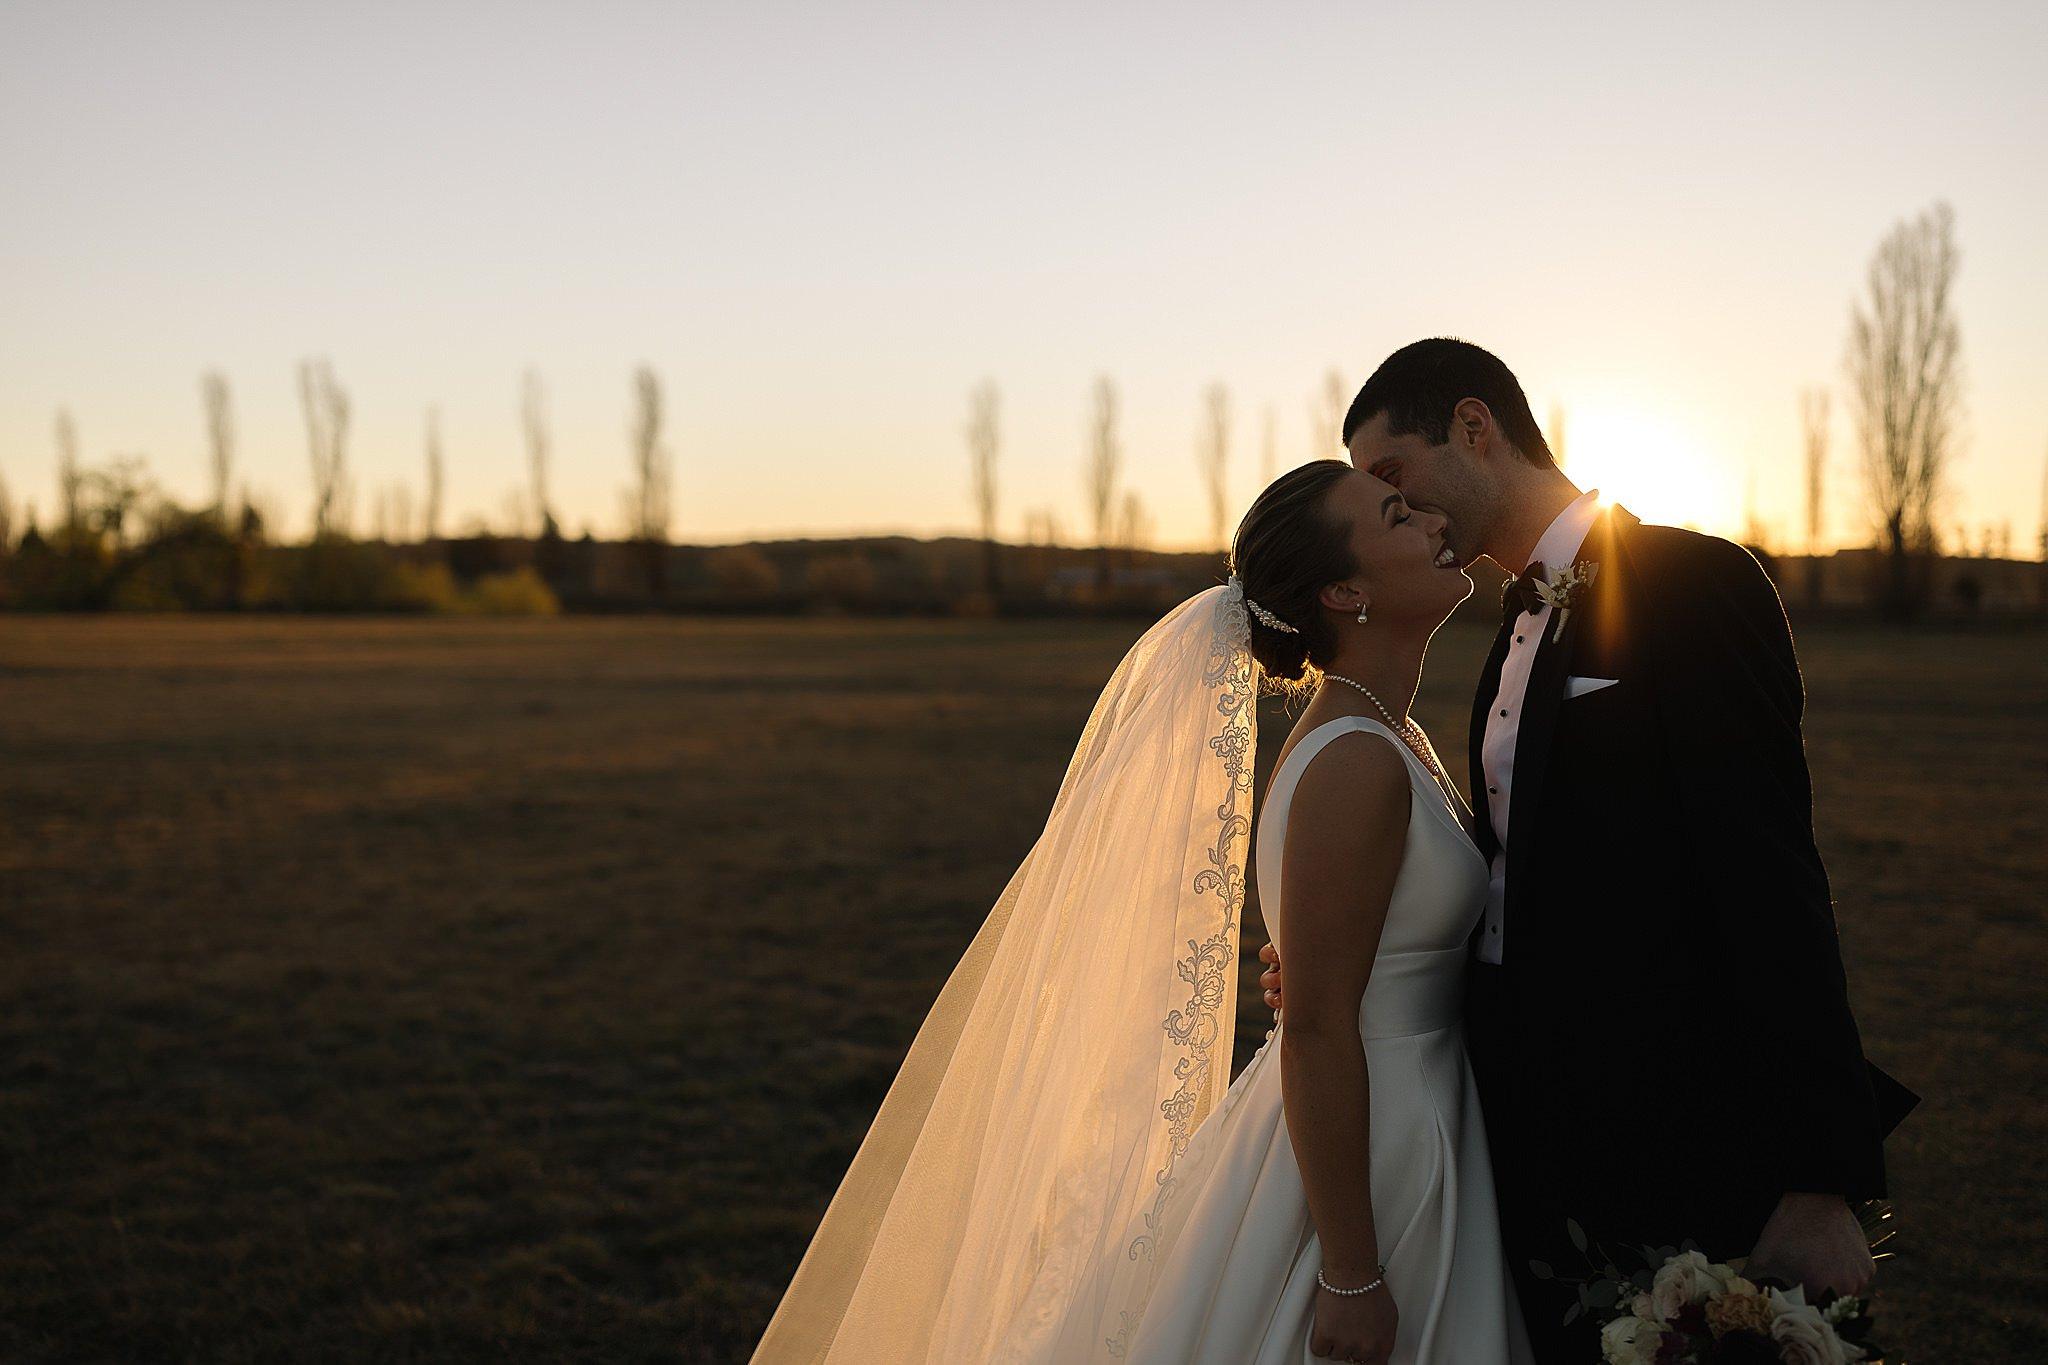 Keepsakephoto,Keepsakephoto by the Keeffes,Gundaroo,Grazing,Grazing at Gundaroo,Wedding Inspiration,Wedding,